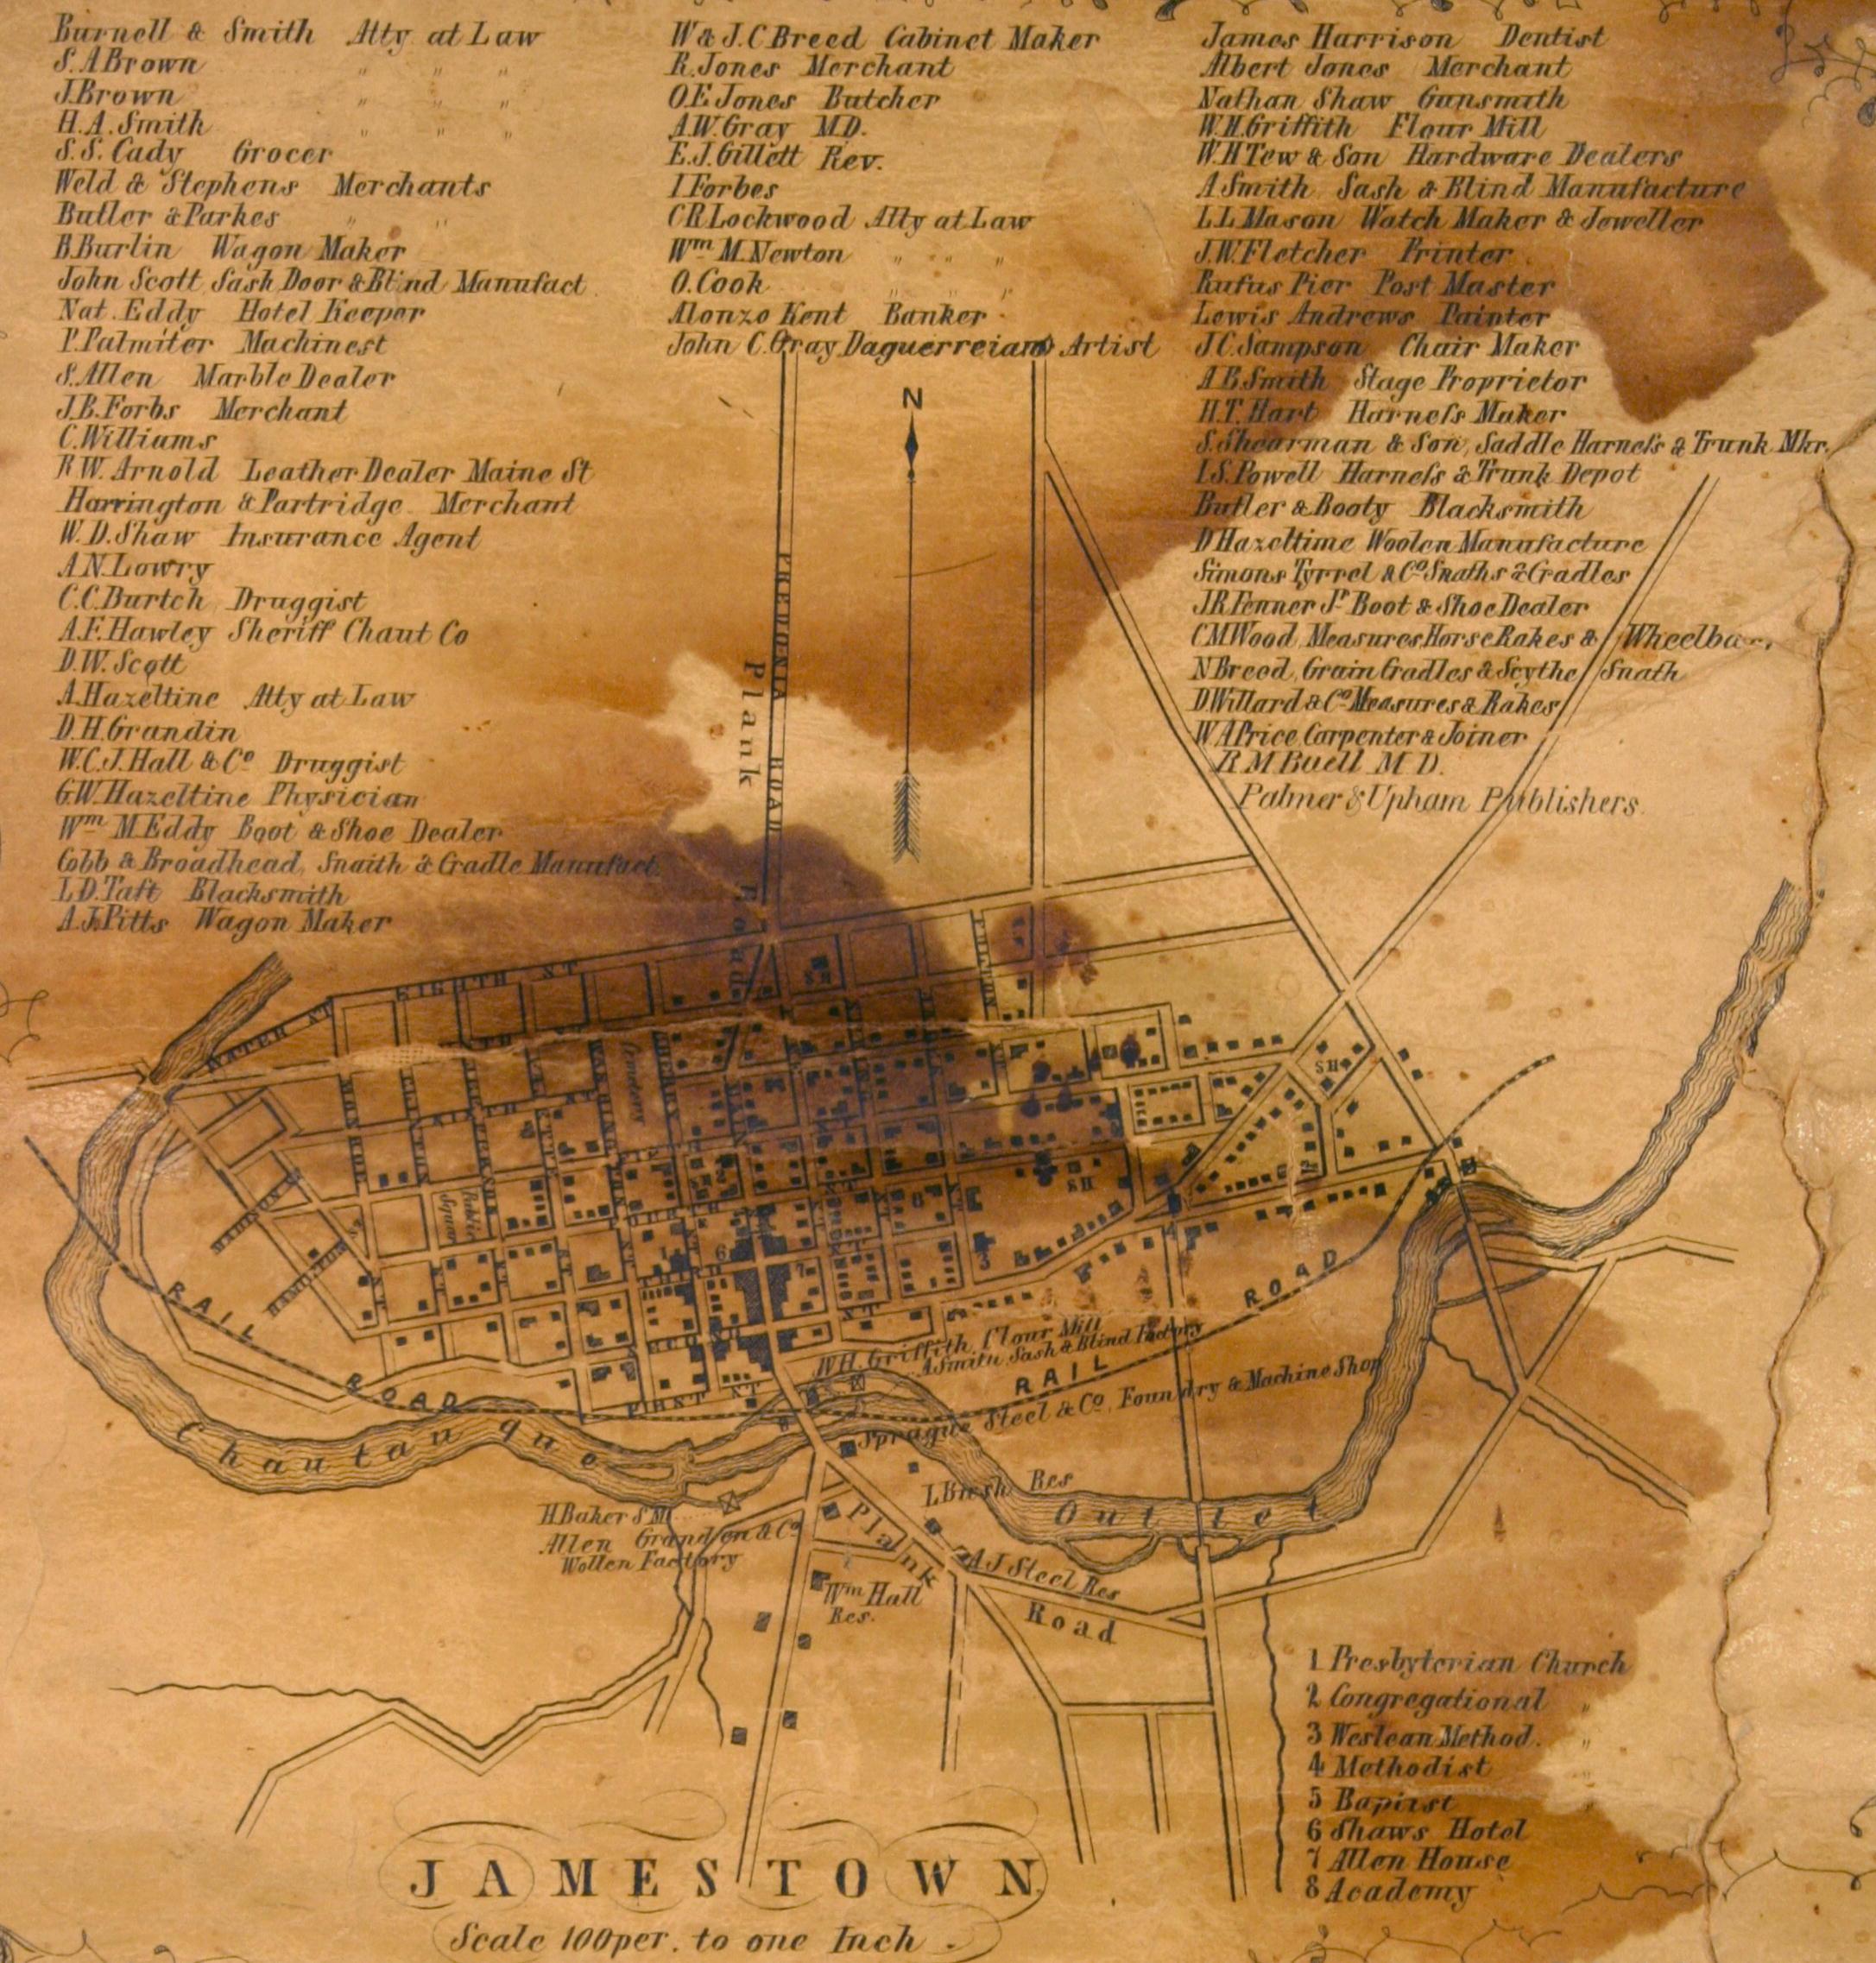 1854 Wall Map of Chautauqua County, NY Chautauqua County Tax Map on clay county tax maps, tioga county tax maps, wayne county tax maps, tuscarawas county tax maps, nassau county tax maps, steuben county tax maps, jackson county tax maps, suffolk county tax maps, clarion county tax maps, venango county tax maps, carroll county tax maps, washington county tax maps, madison county tax maps, columbia county tax maps, marion county tax maps, rabun county tax maps, greene county tax maps, chenango county tax maps, surry county tax maps, delaware county tax maps,